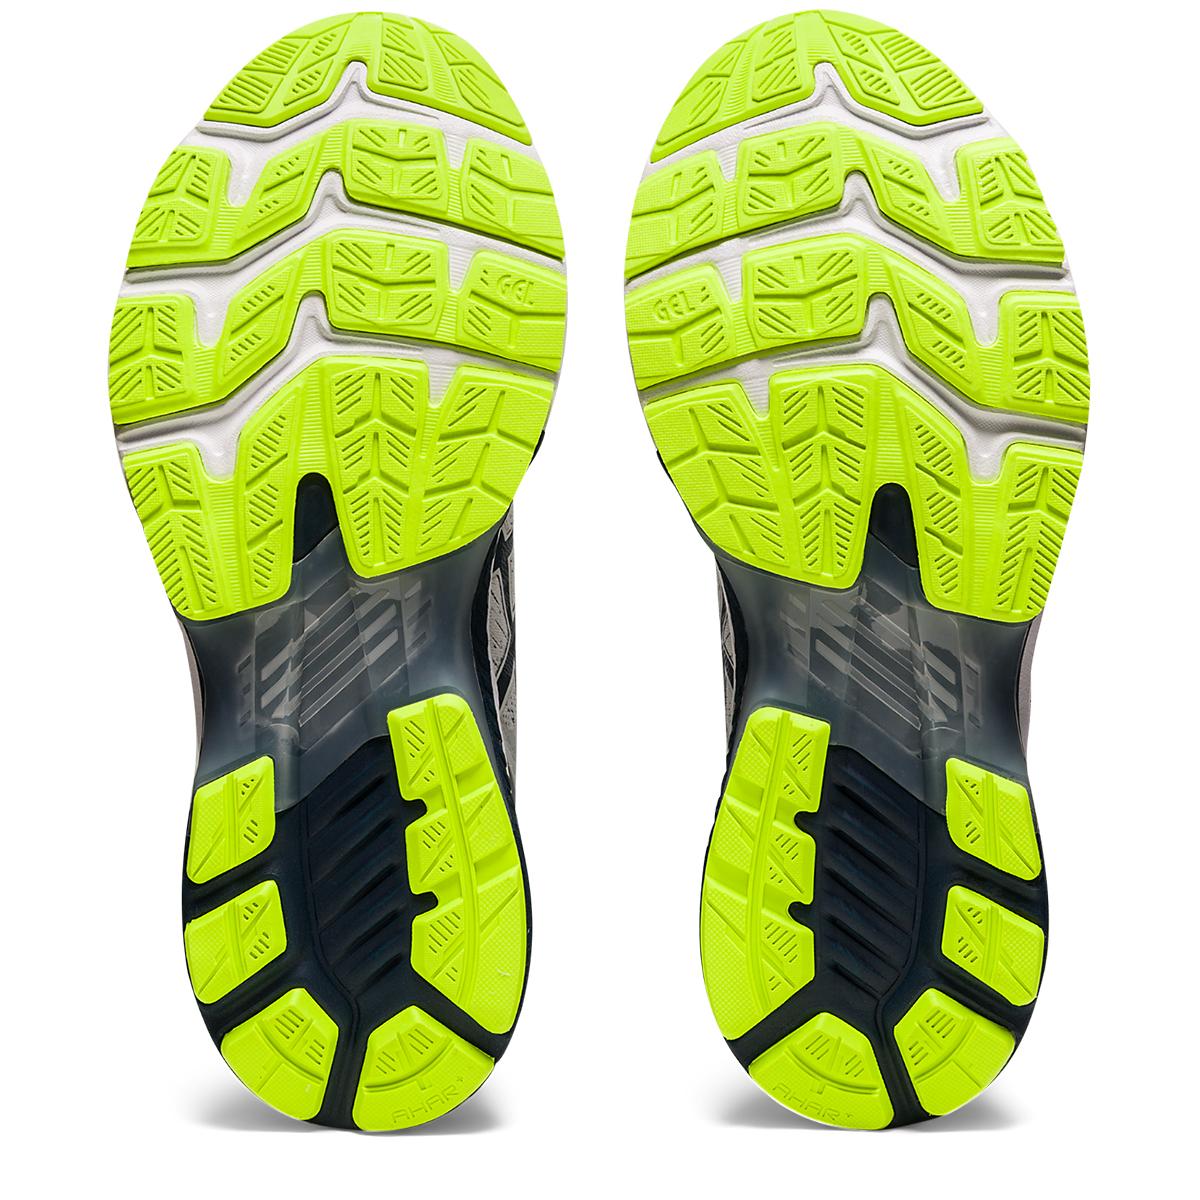 Men's Asics Gel-Kayano 27 Running Shoe - Color: Grey/Green/Blue - Size: 7 - Width: Regular, Grey/Green/Blue, large, image 3